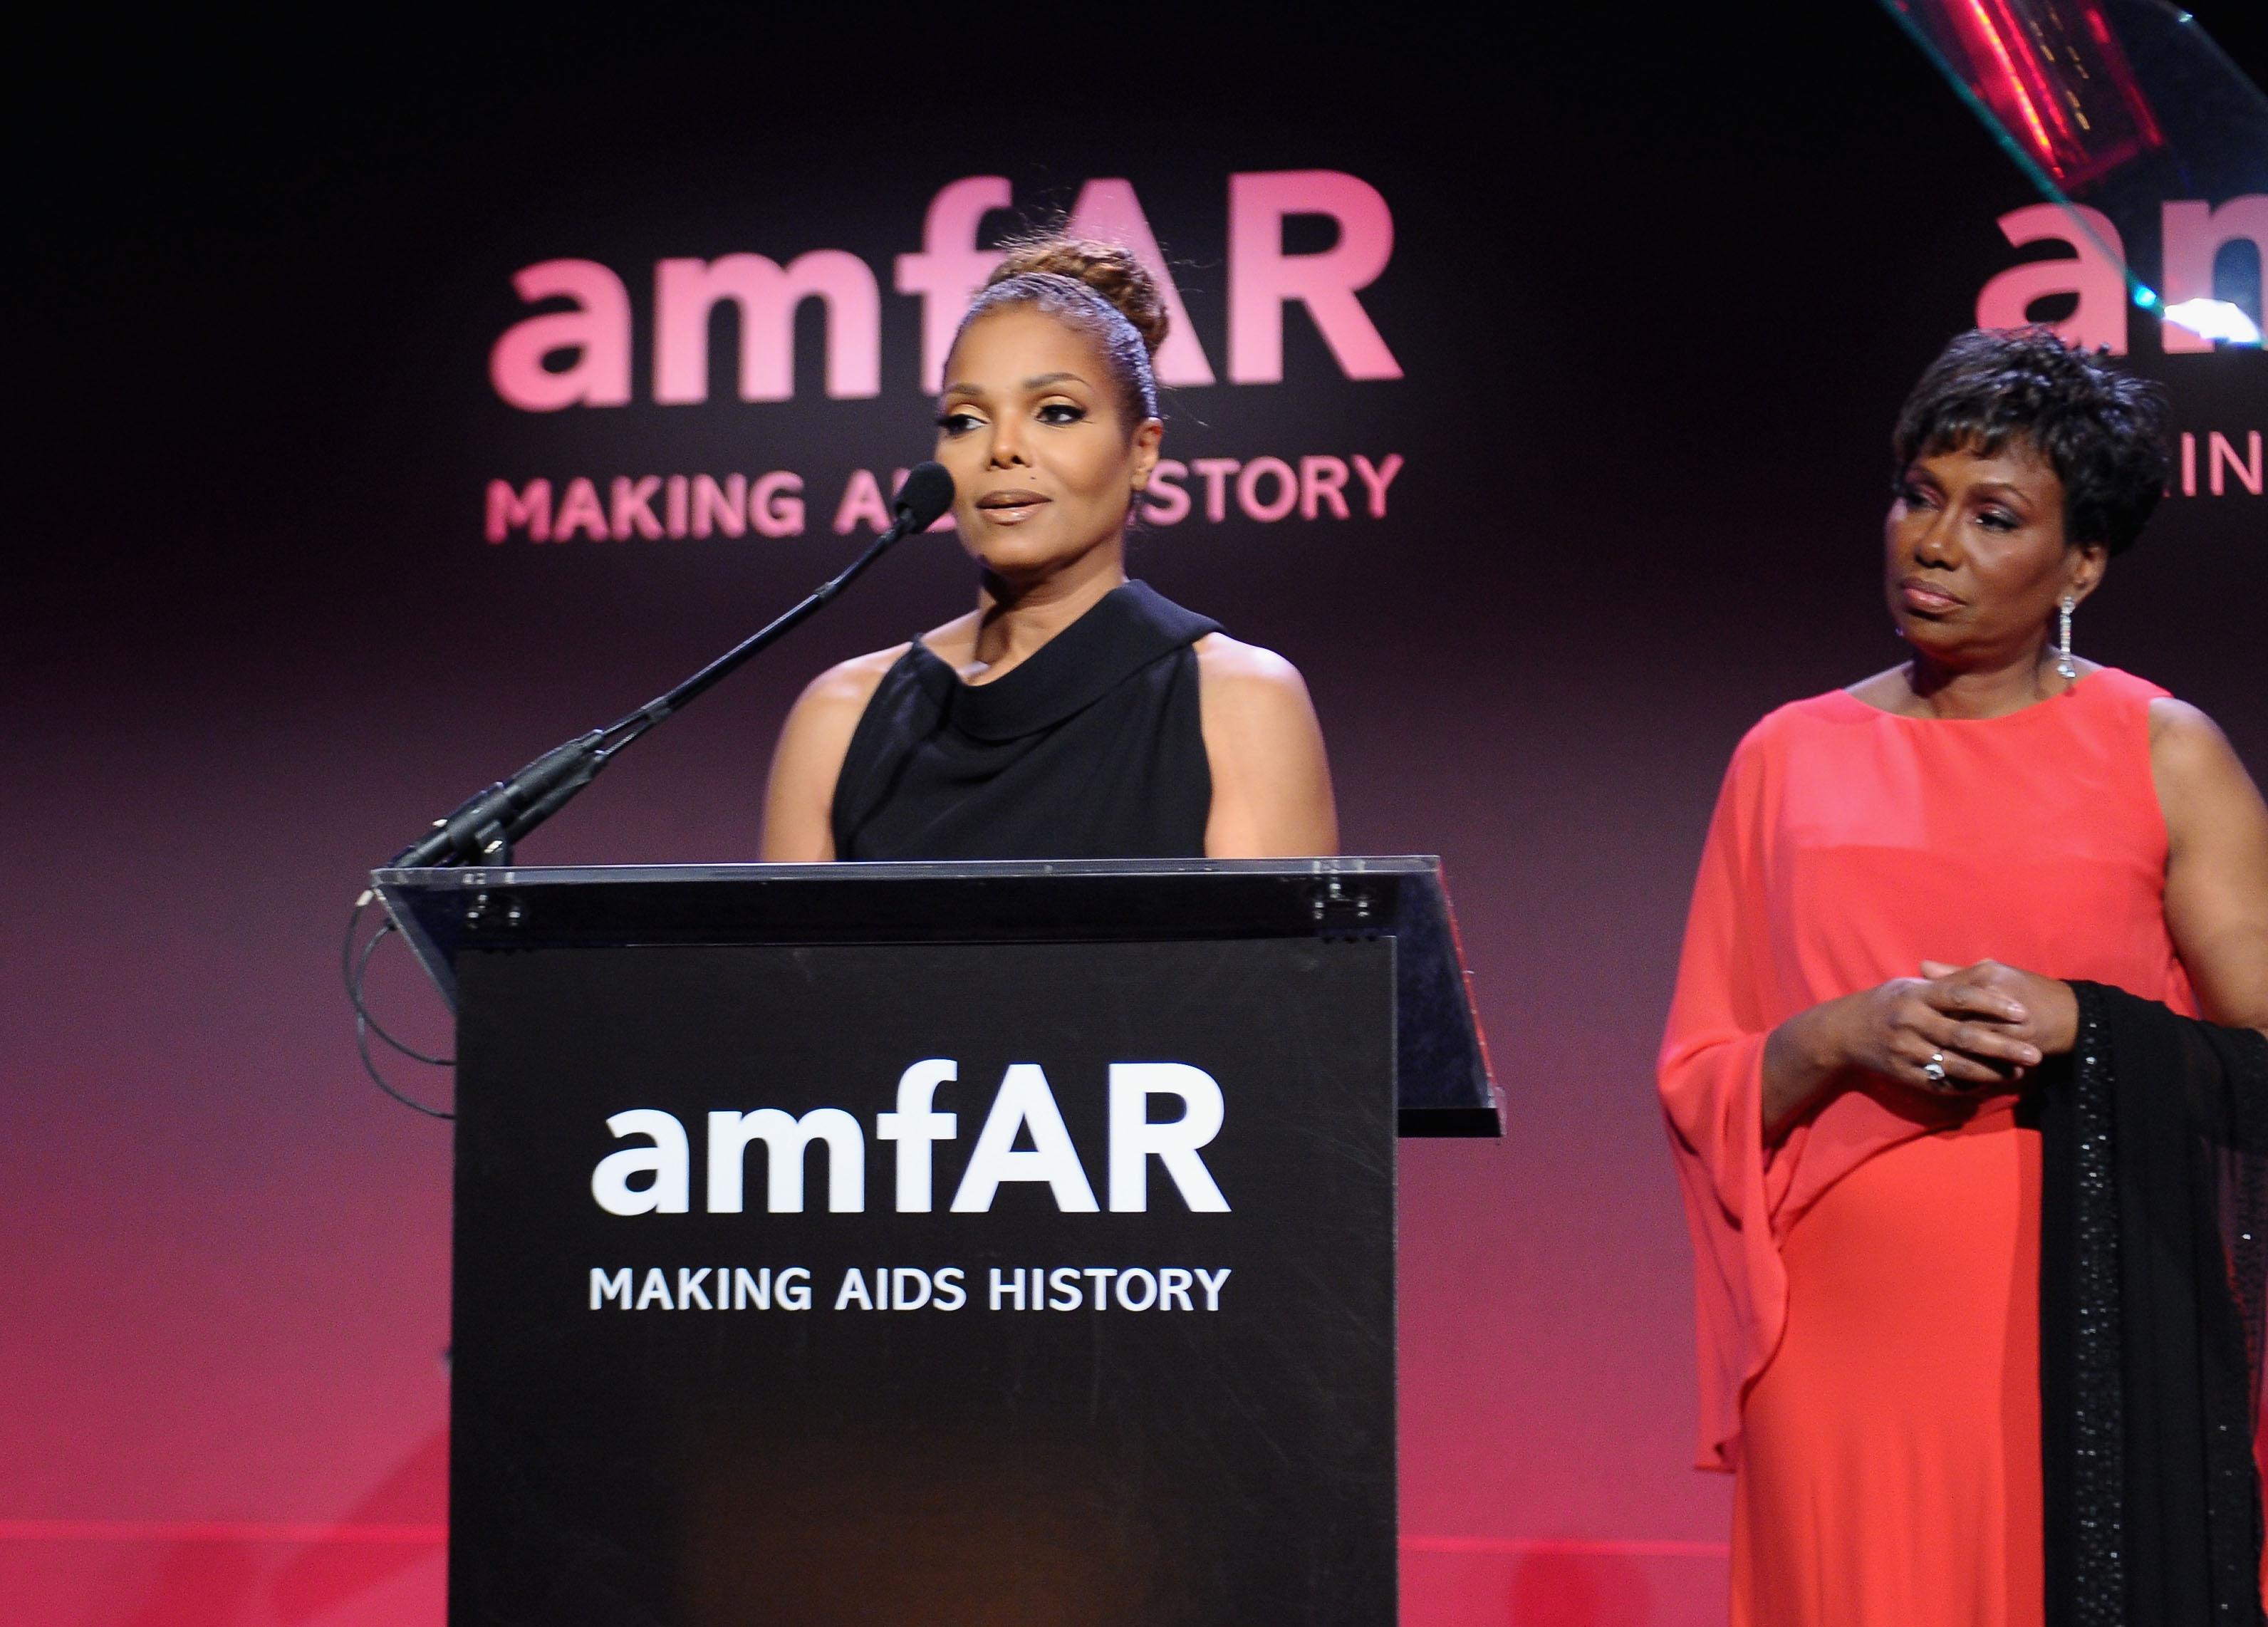 On Wednesday night, Janet Jackson presented an award at the amfAR New York Gala.